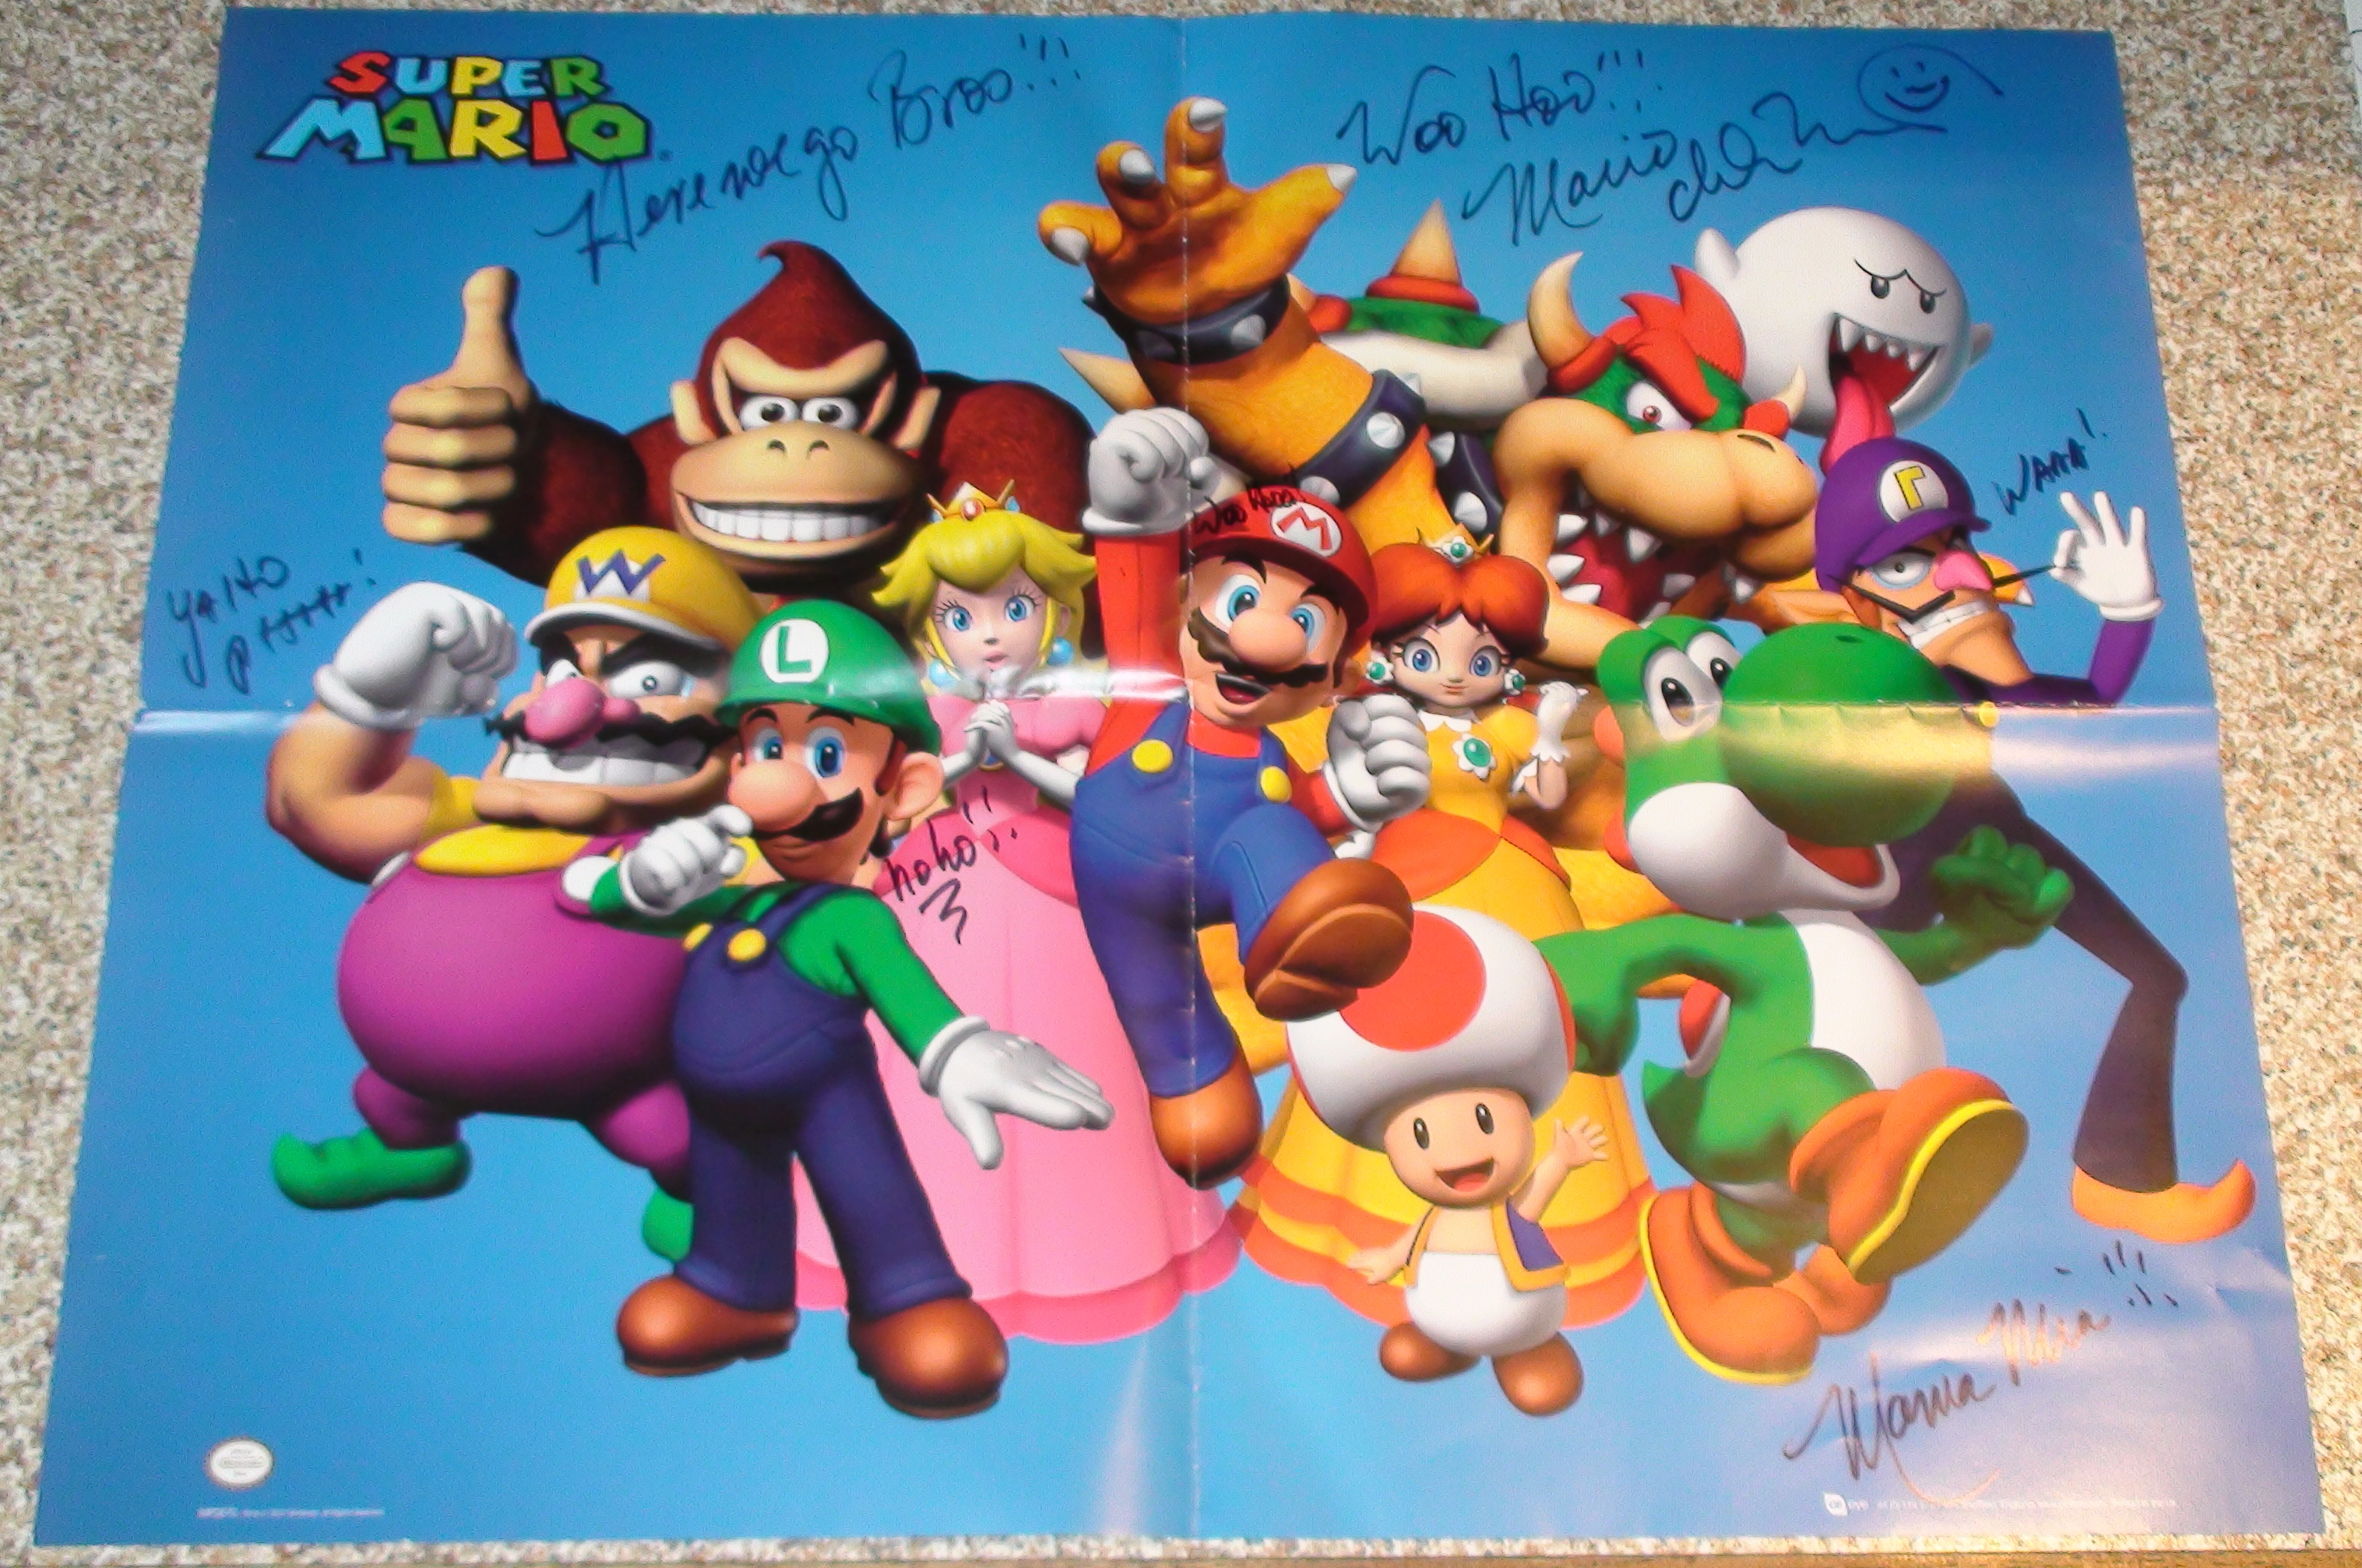 Super Mario - Charles Martinet